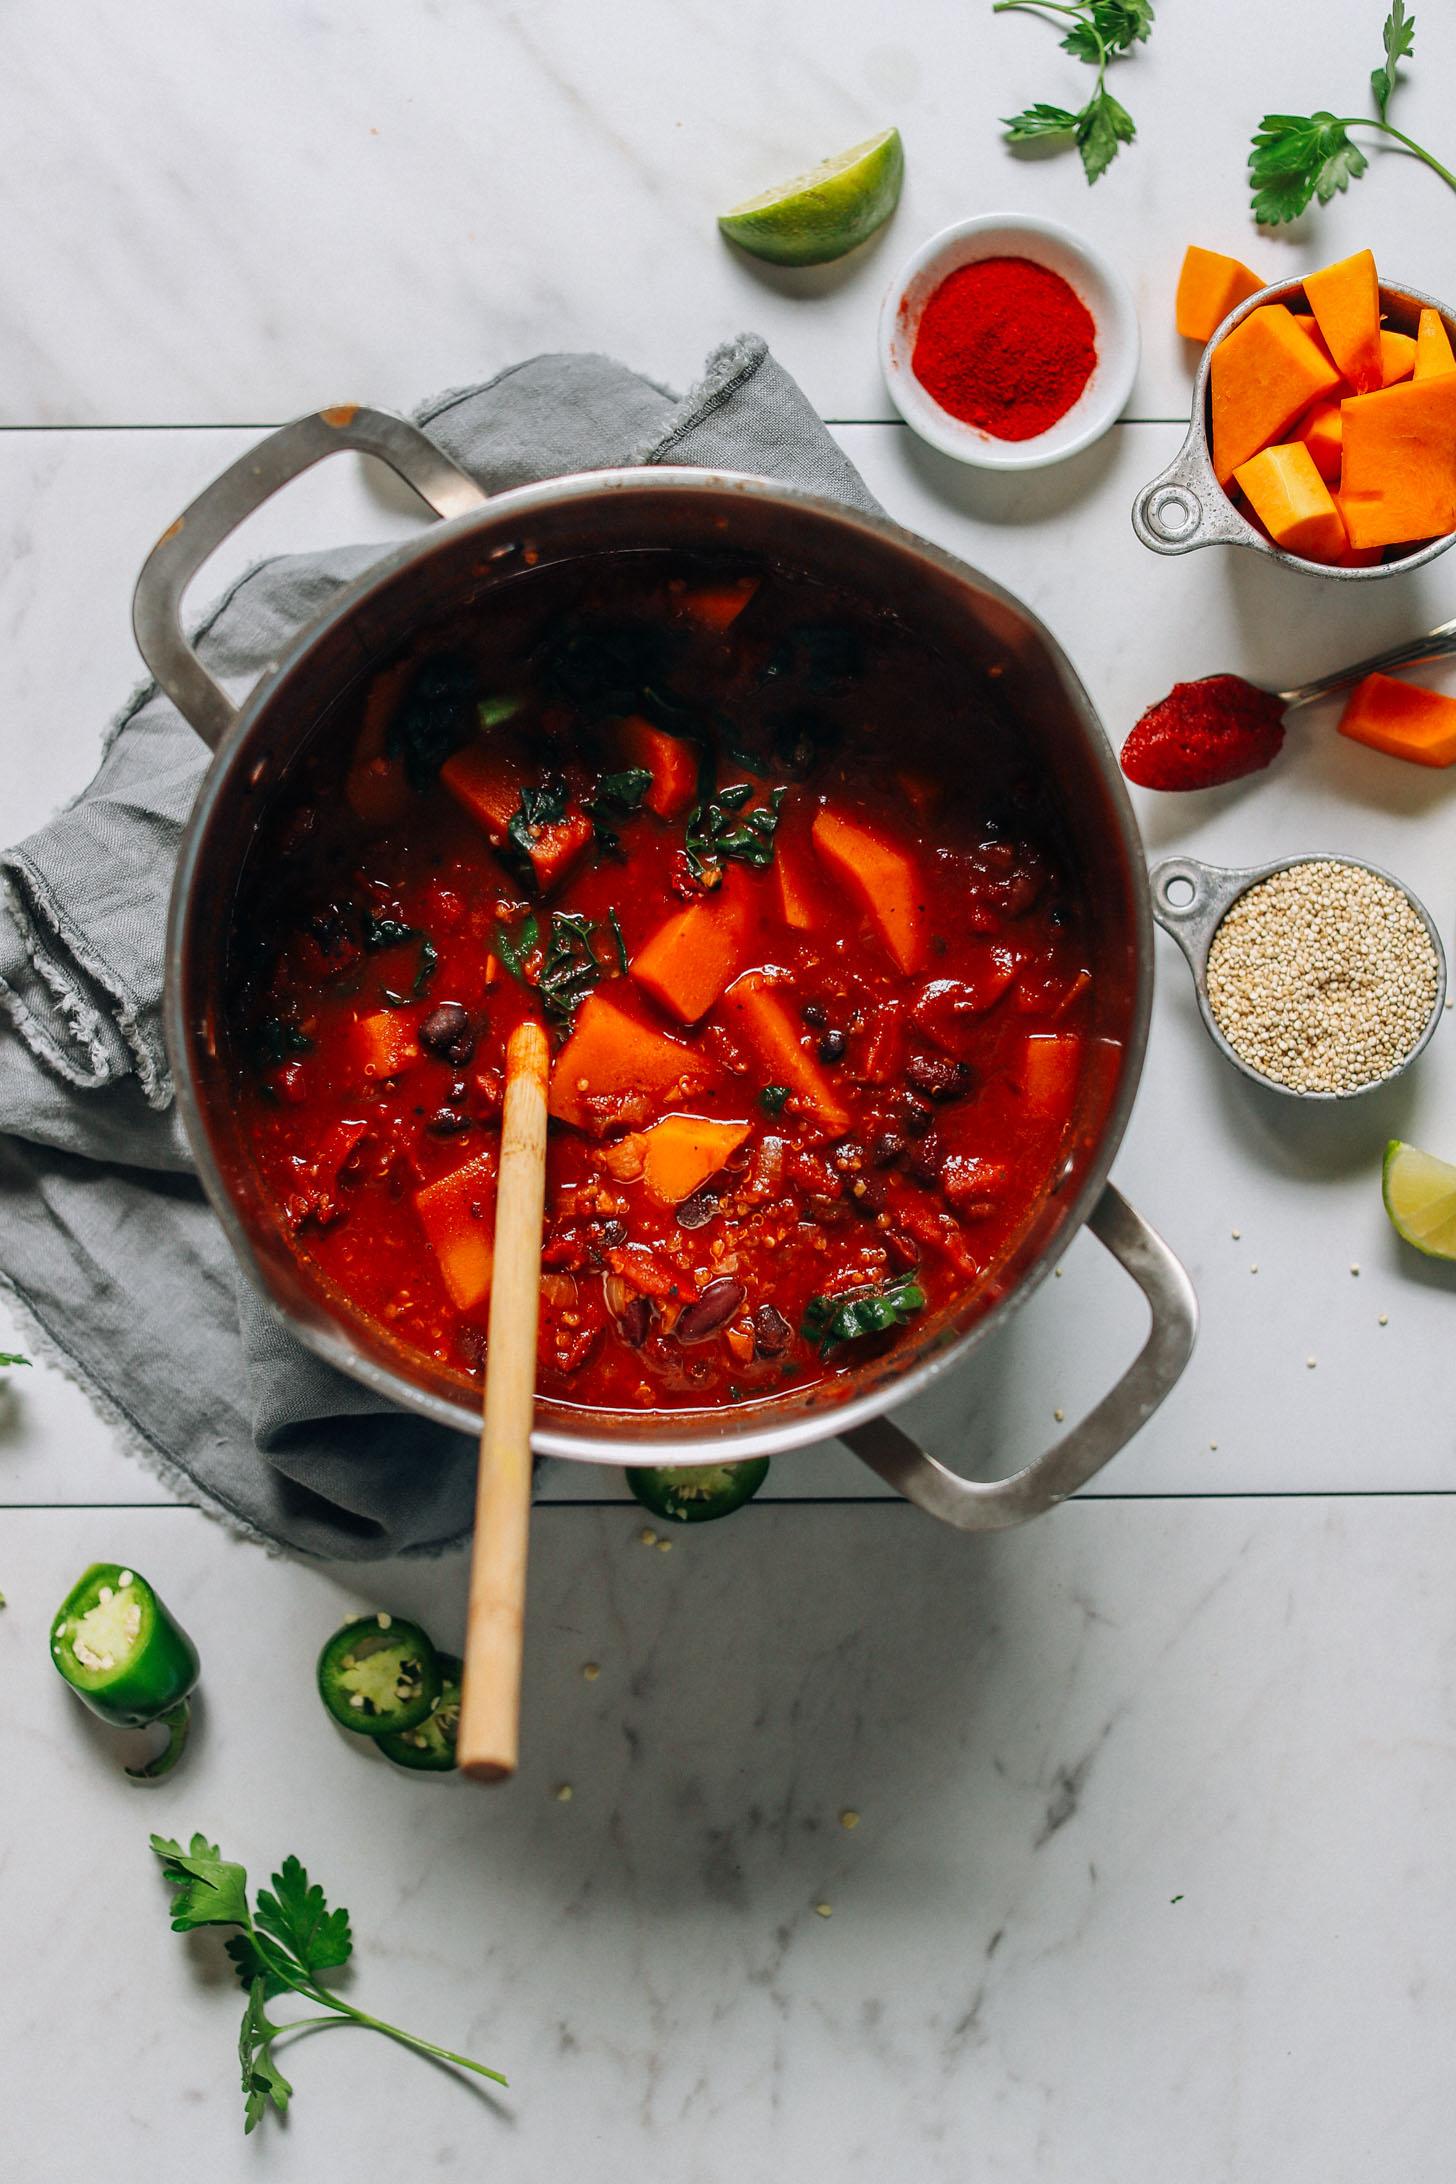 Making a big pot of hearty vegan Butternut Squash Quinoa Chili